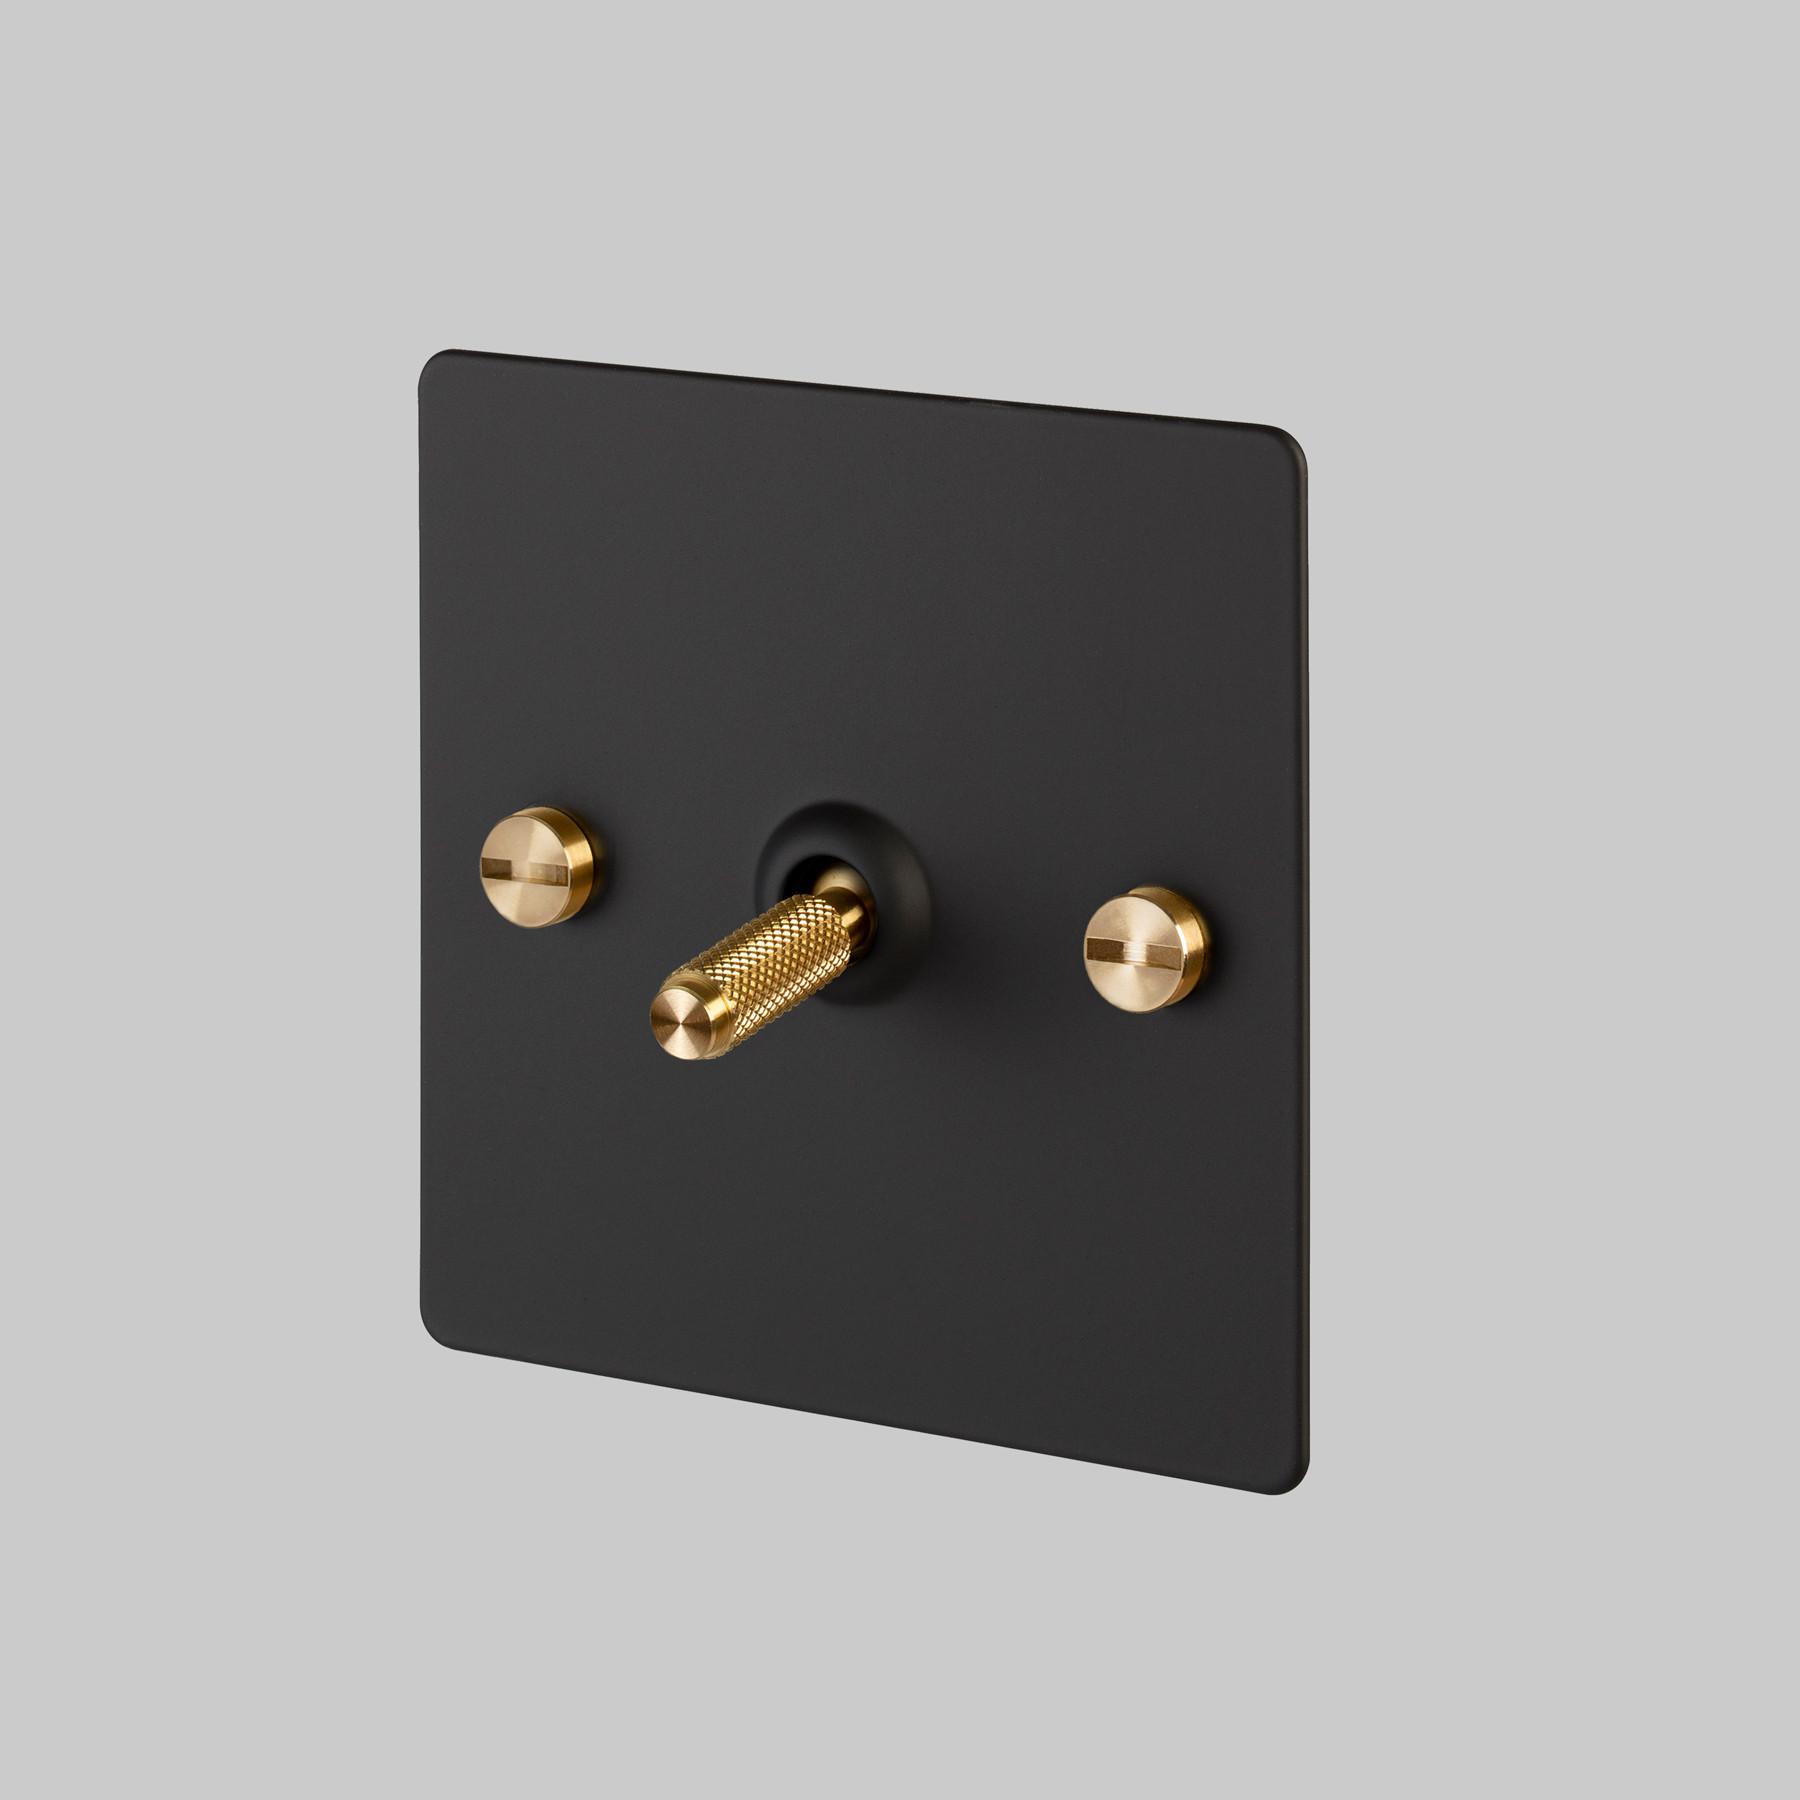 1G TOGGLE SWITCH / BLACK / BRASS